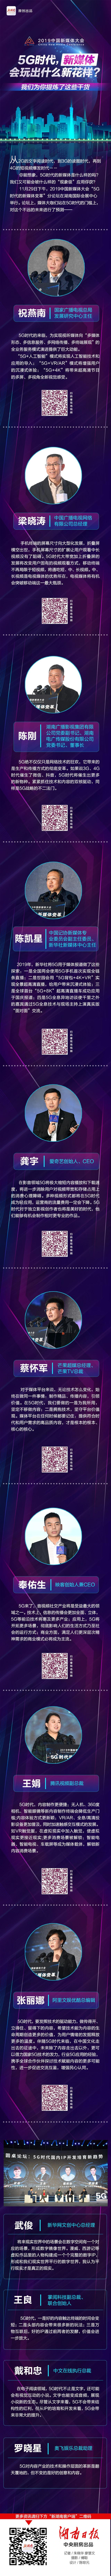 5G时代,新媒体会玩出什么新花样?这些干货不能错过! 新湖南www.hunanabc.com